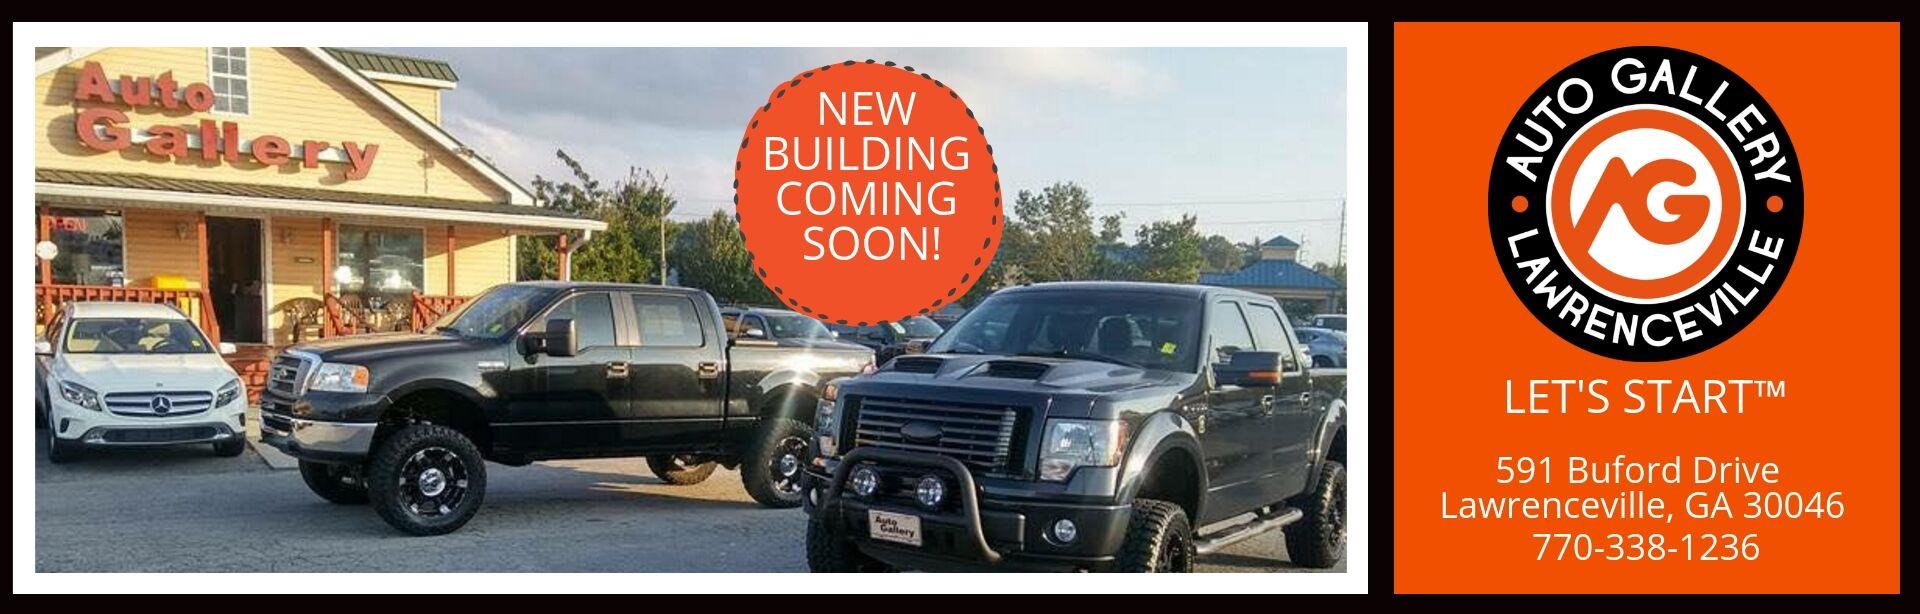 Car Dealerships In Augusta Ga >> Town Square Motors Lawrenceville Ga - impremedia.net